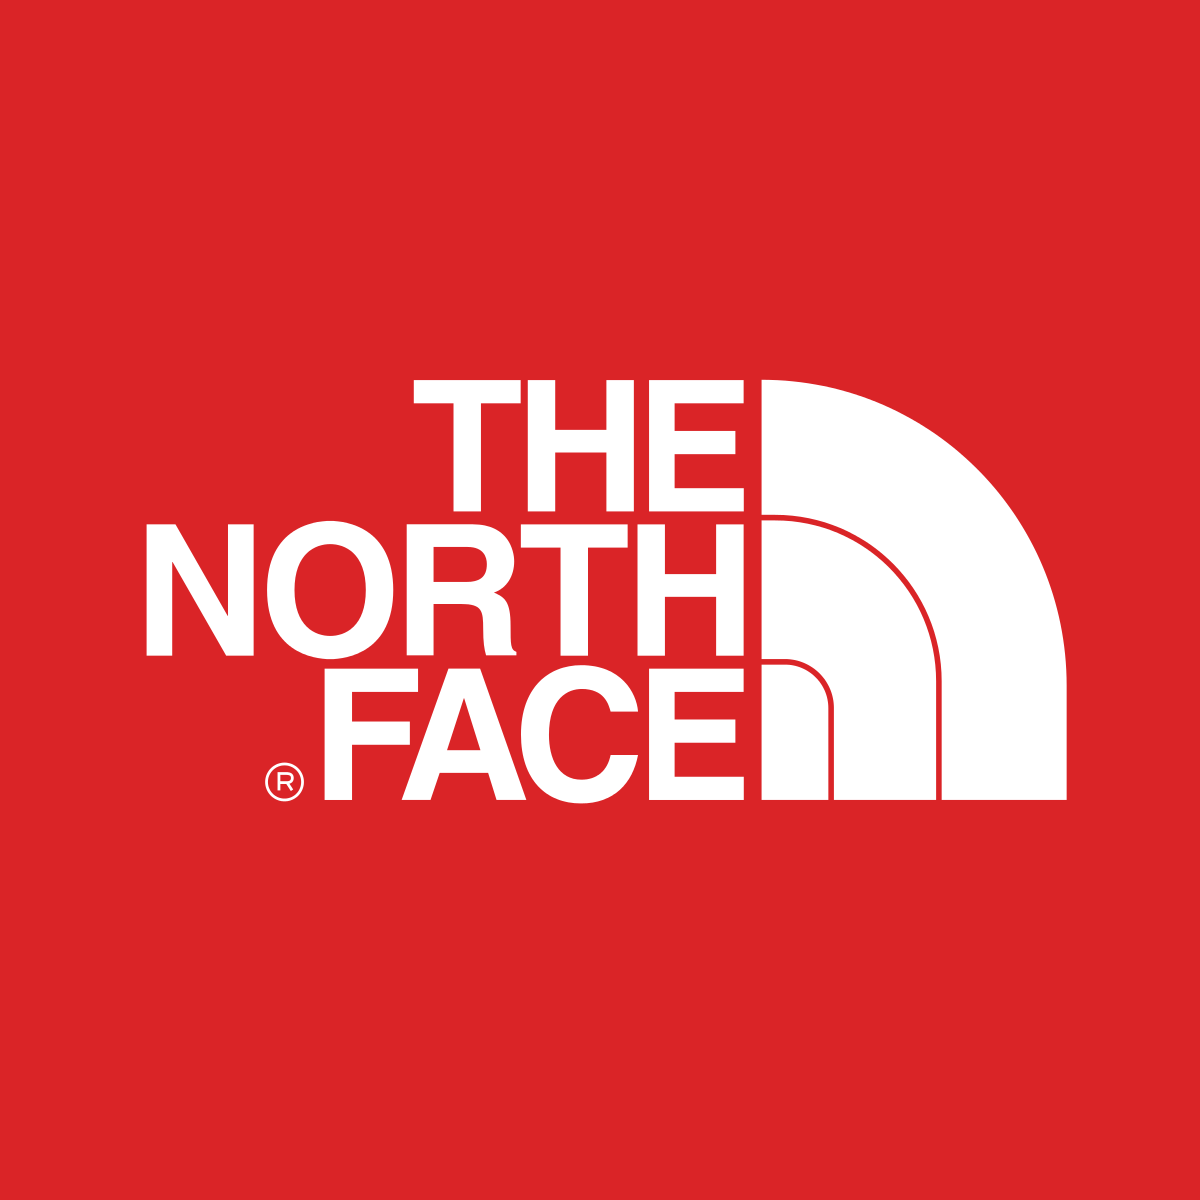 TheNorthFace одежда оригинал купить Украина